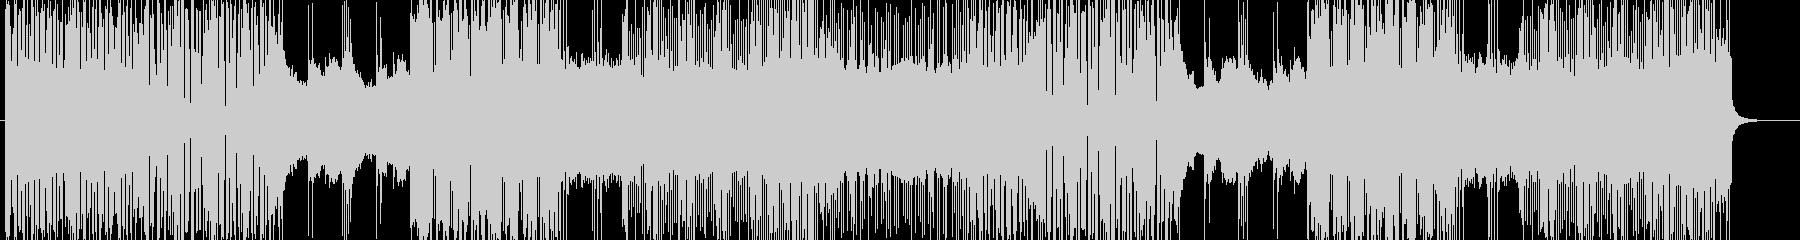 「HR/HM」「POWER」BGM252の未再生の波形